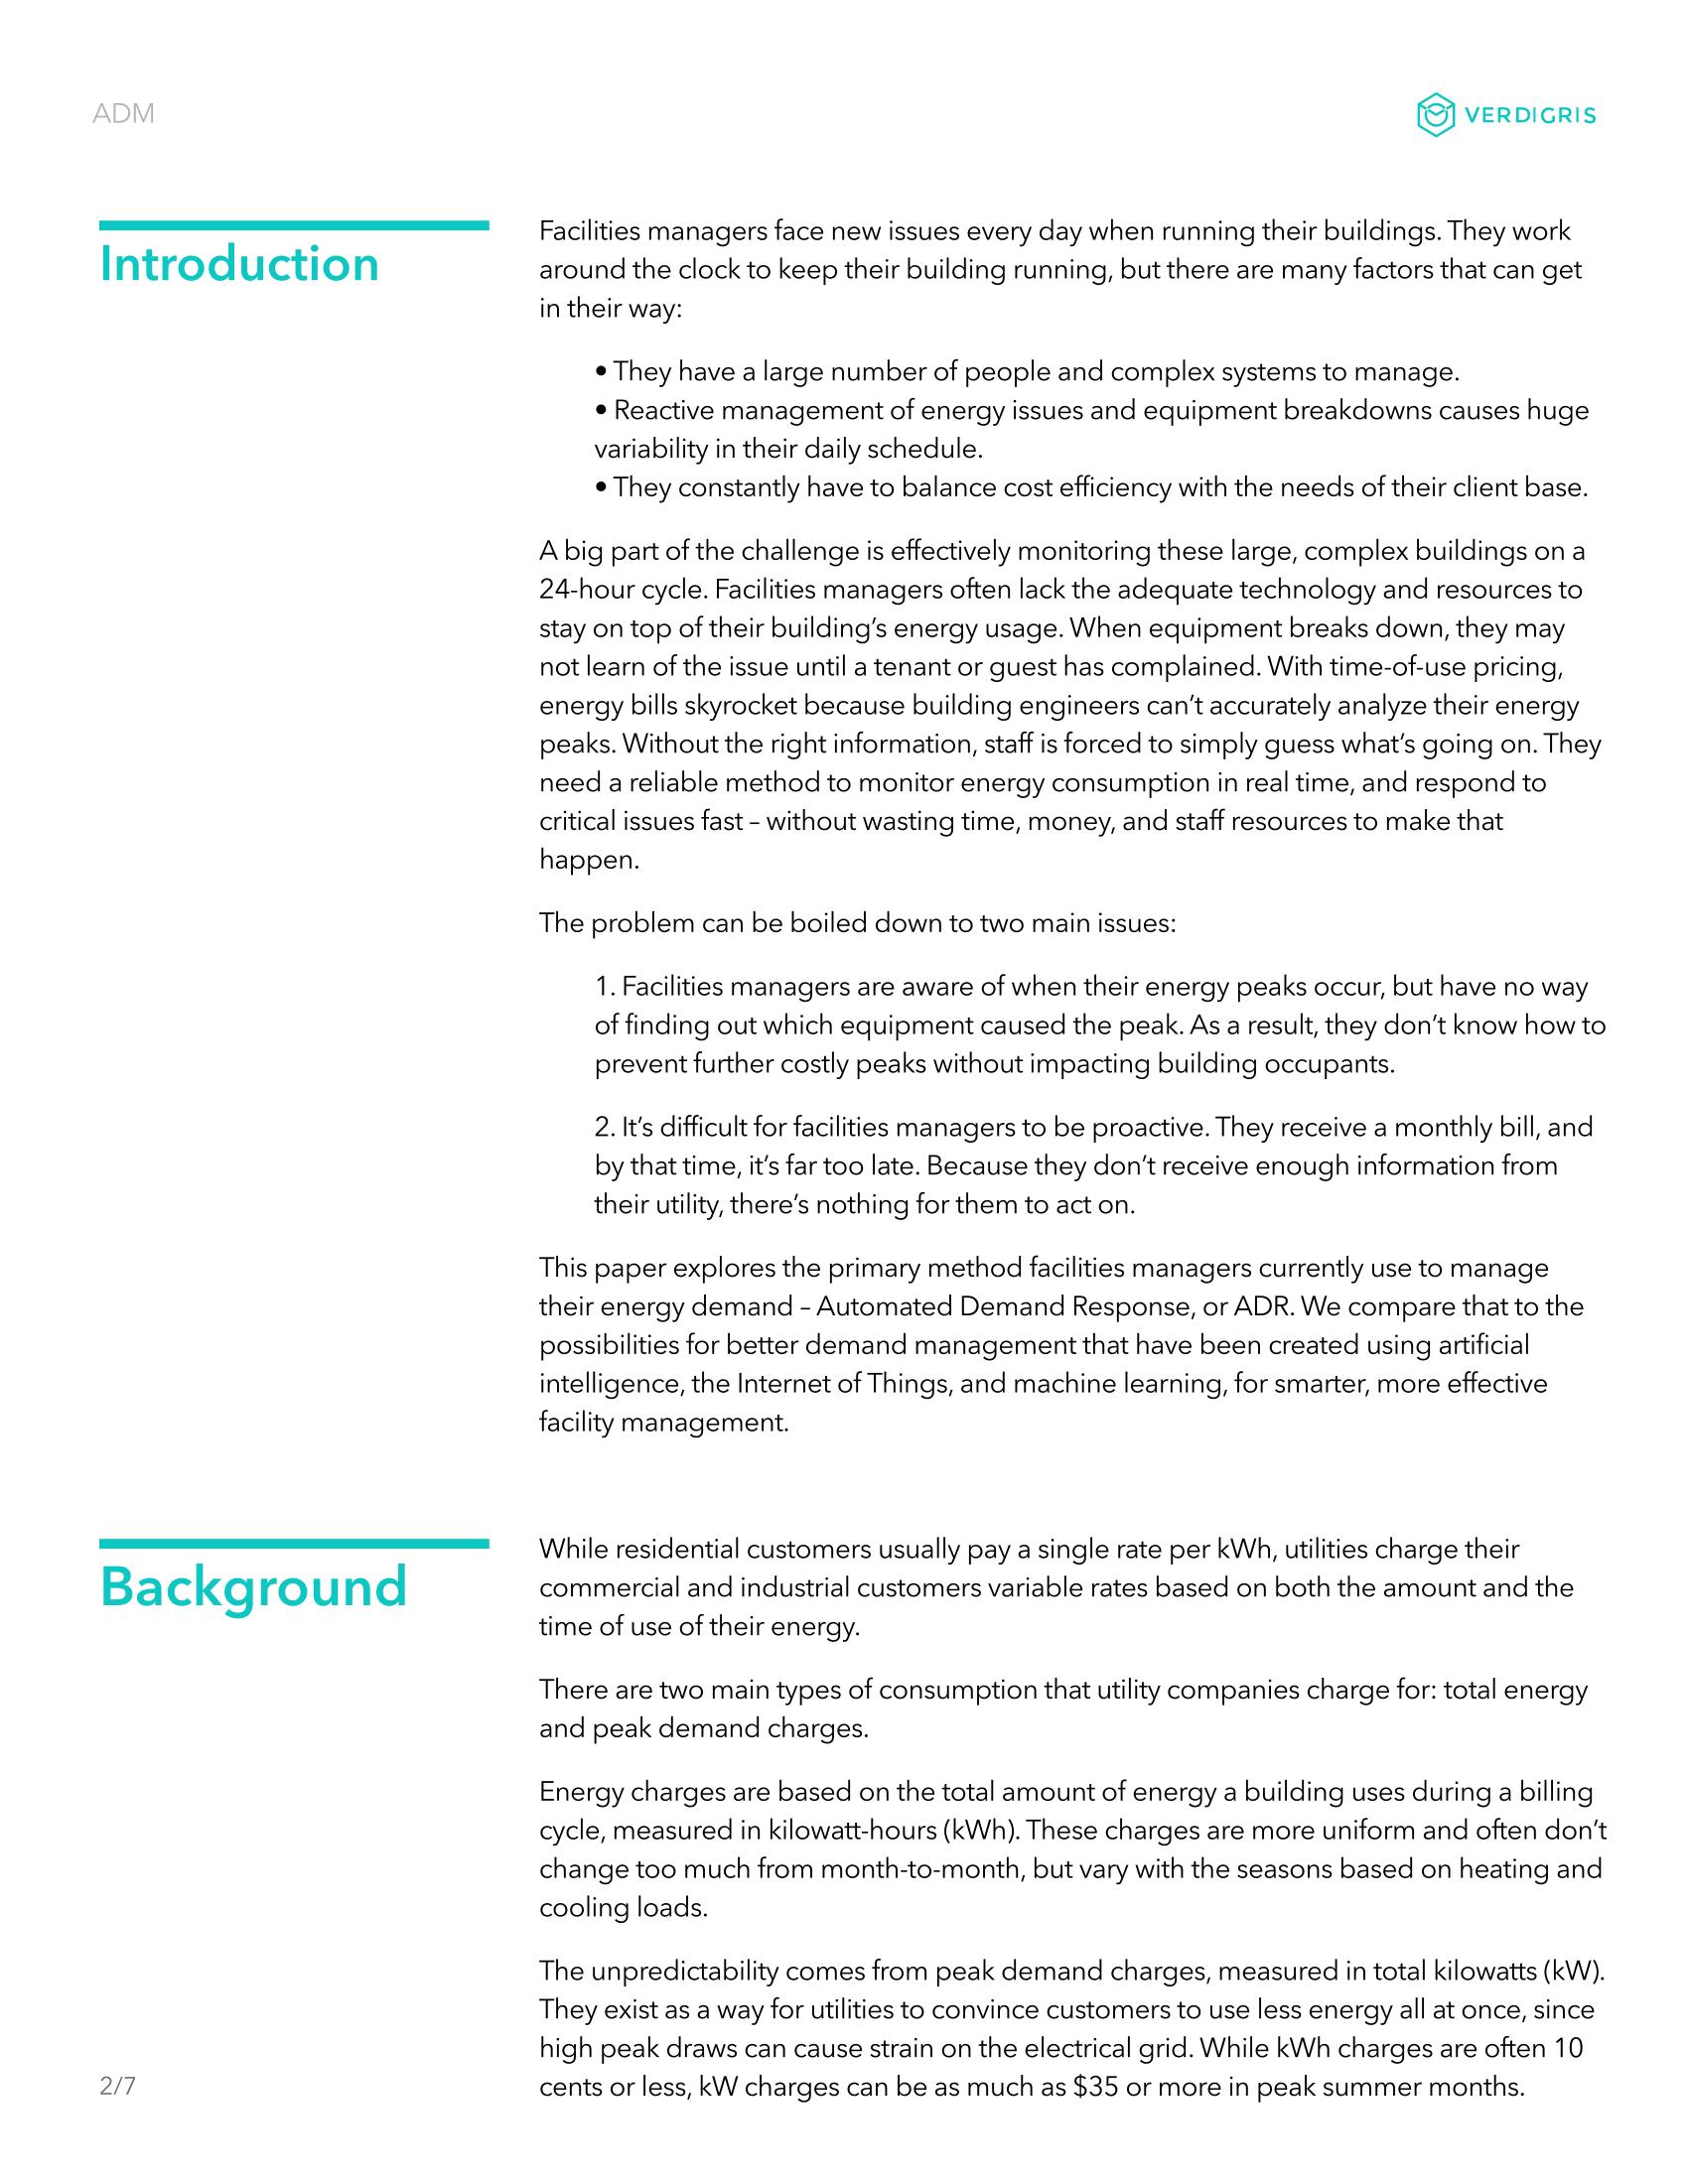 Automated Demand Management 2